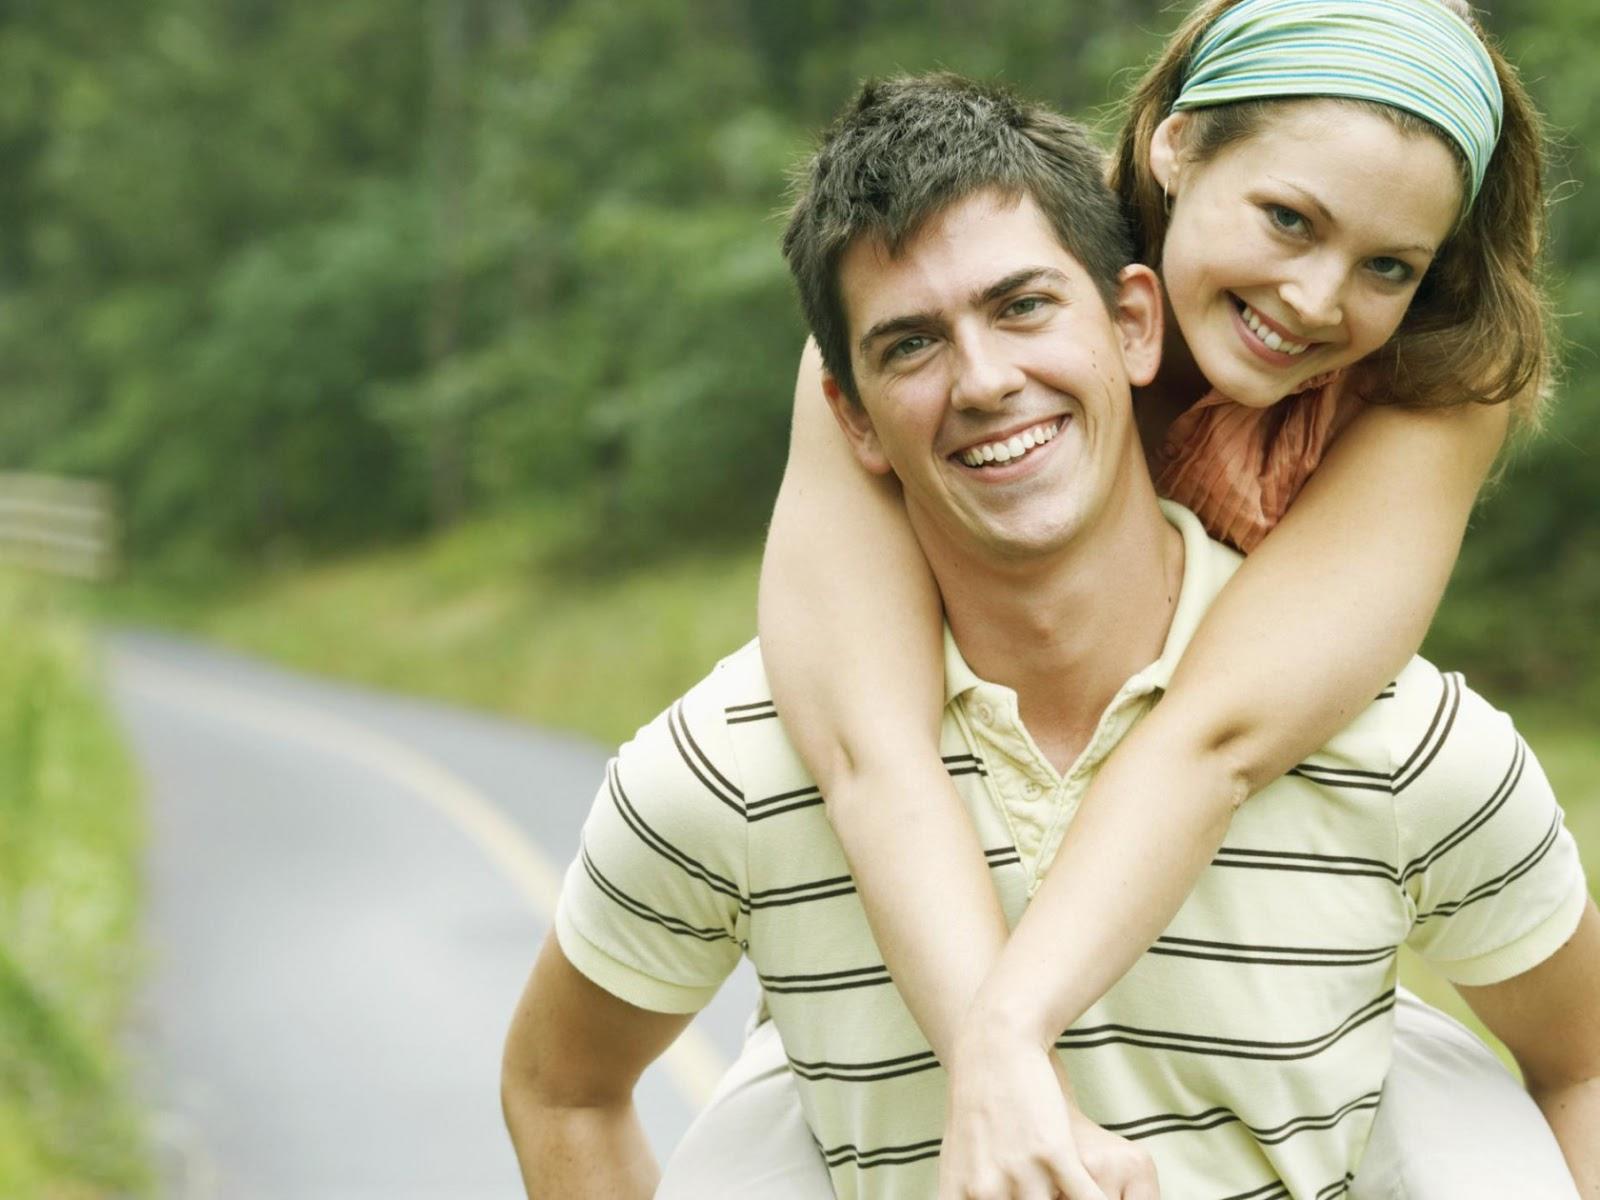 Get lost lover back ?: Lal Kitab Totke for Love Marriage